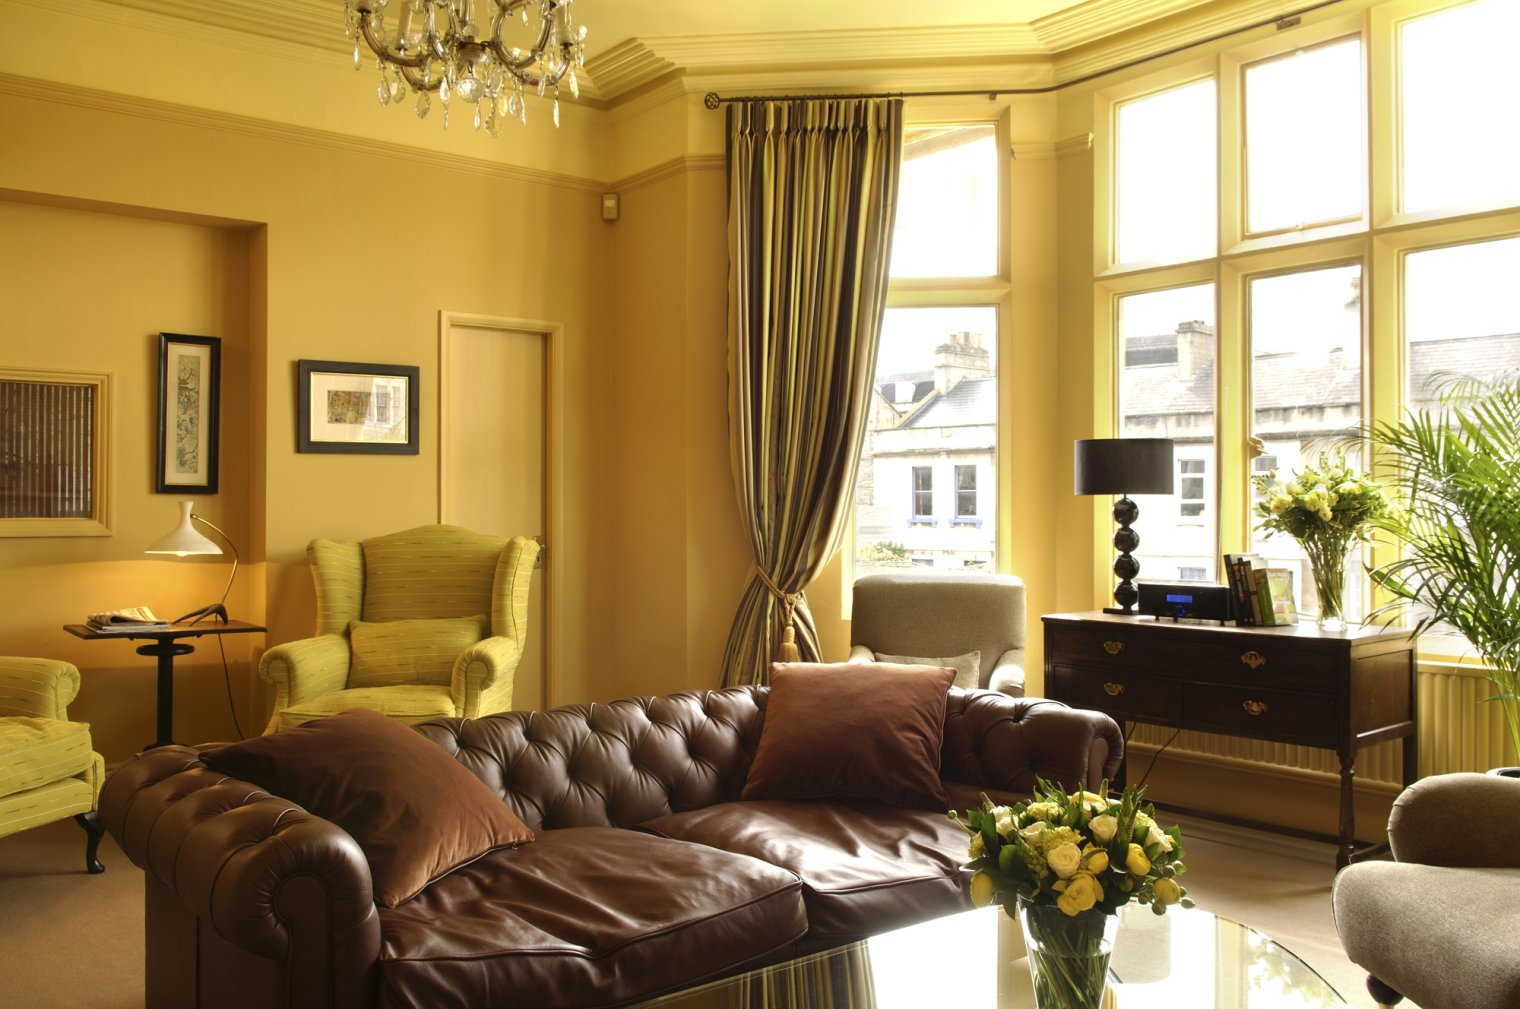 Creative Living Room Interior Design photo - 1